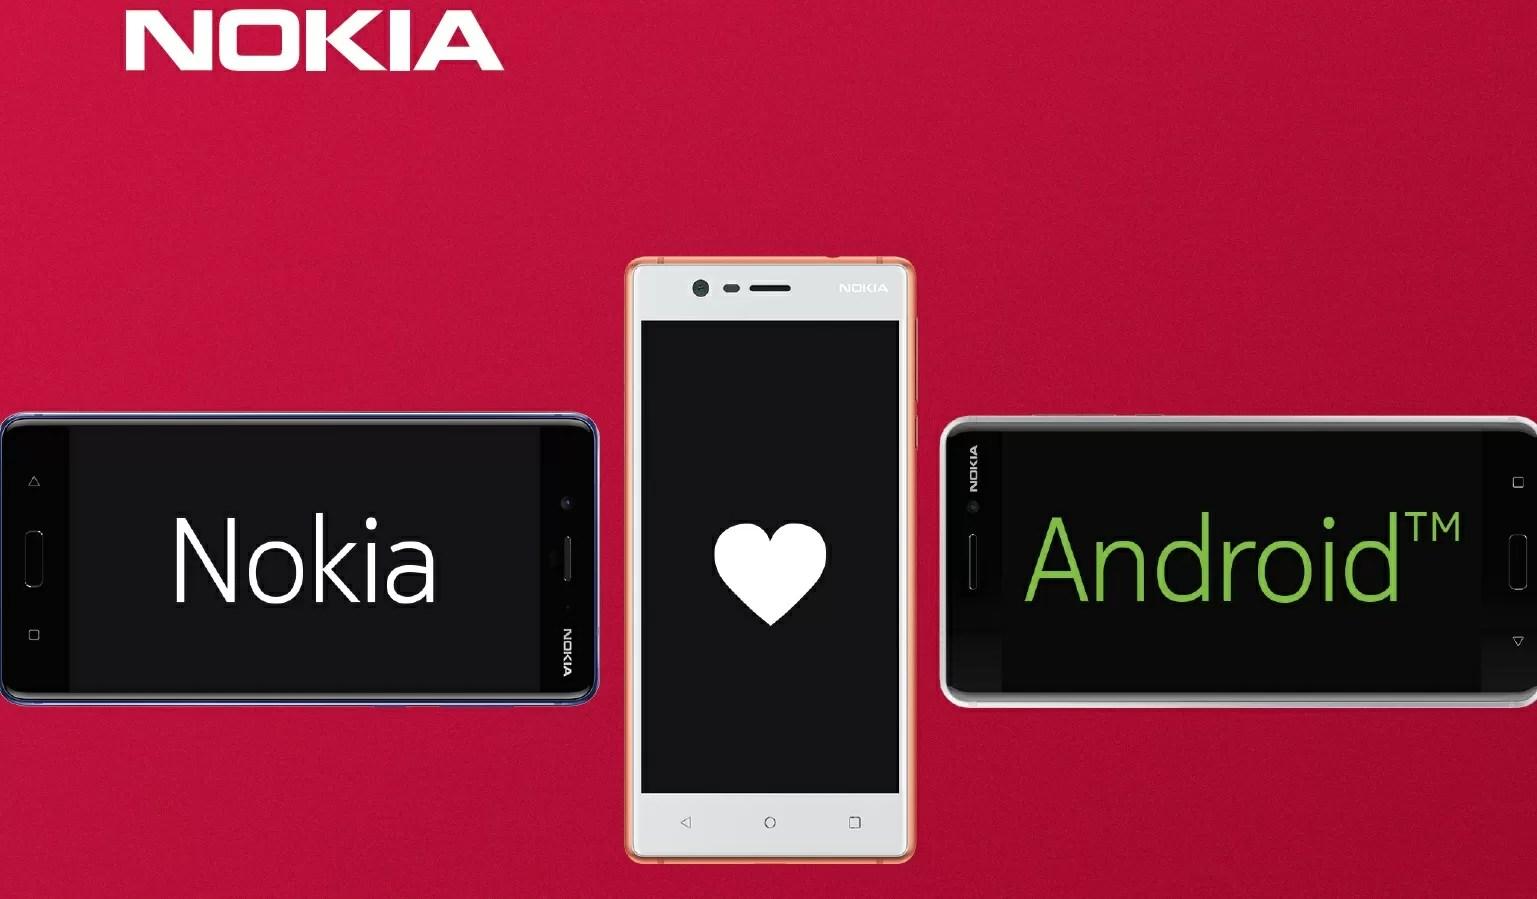 In anteprima le immagini ufficiali di Nokia 7 Plus e Nokia 1